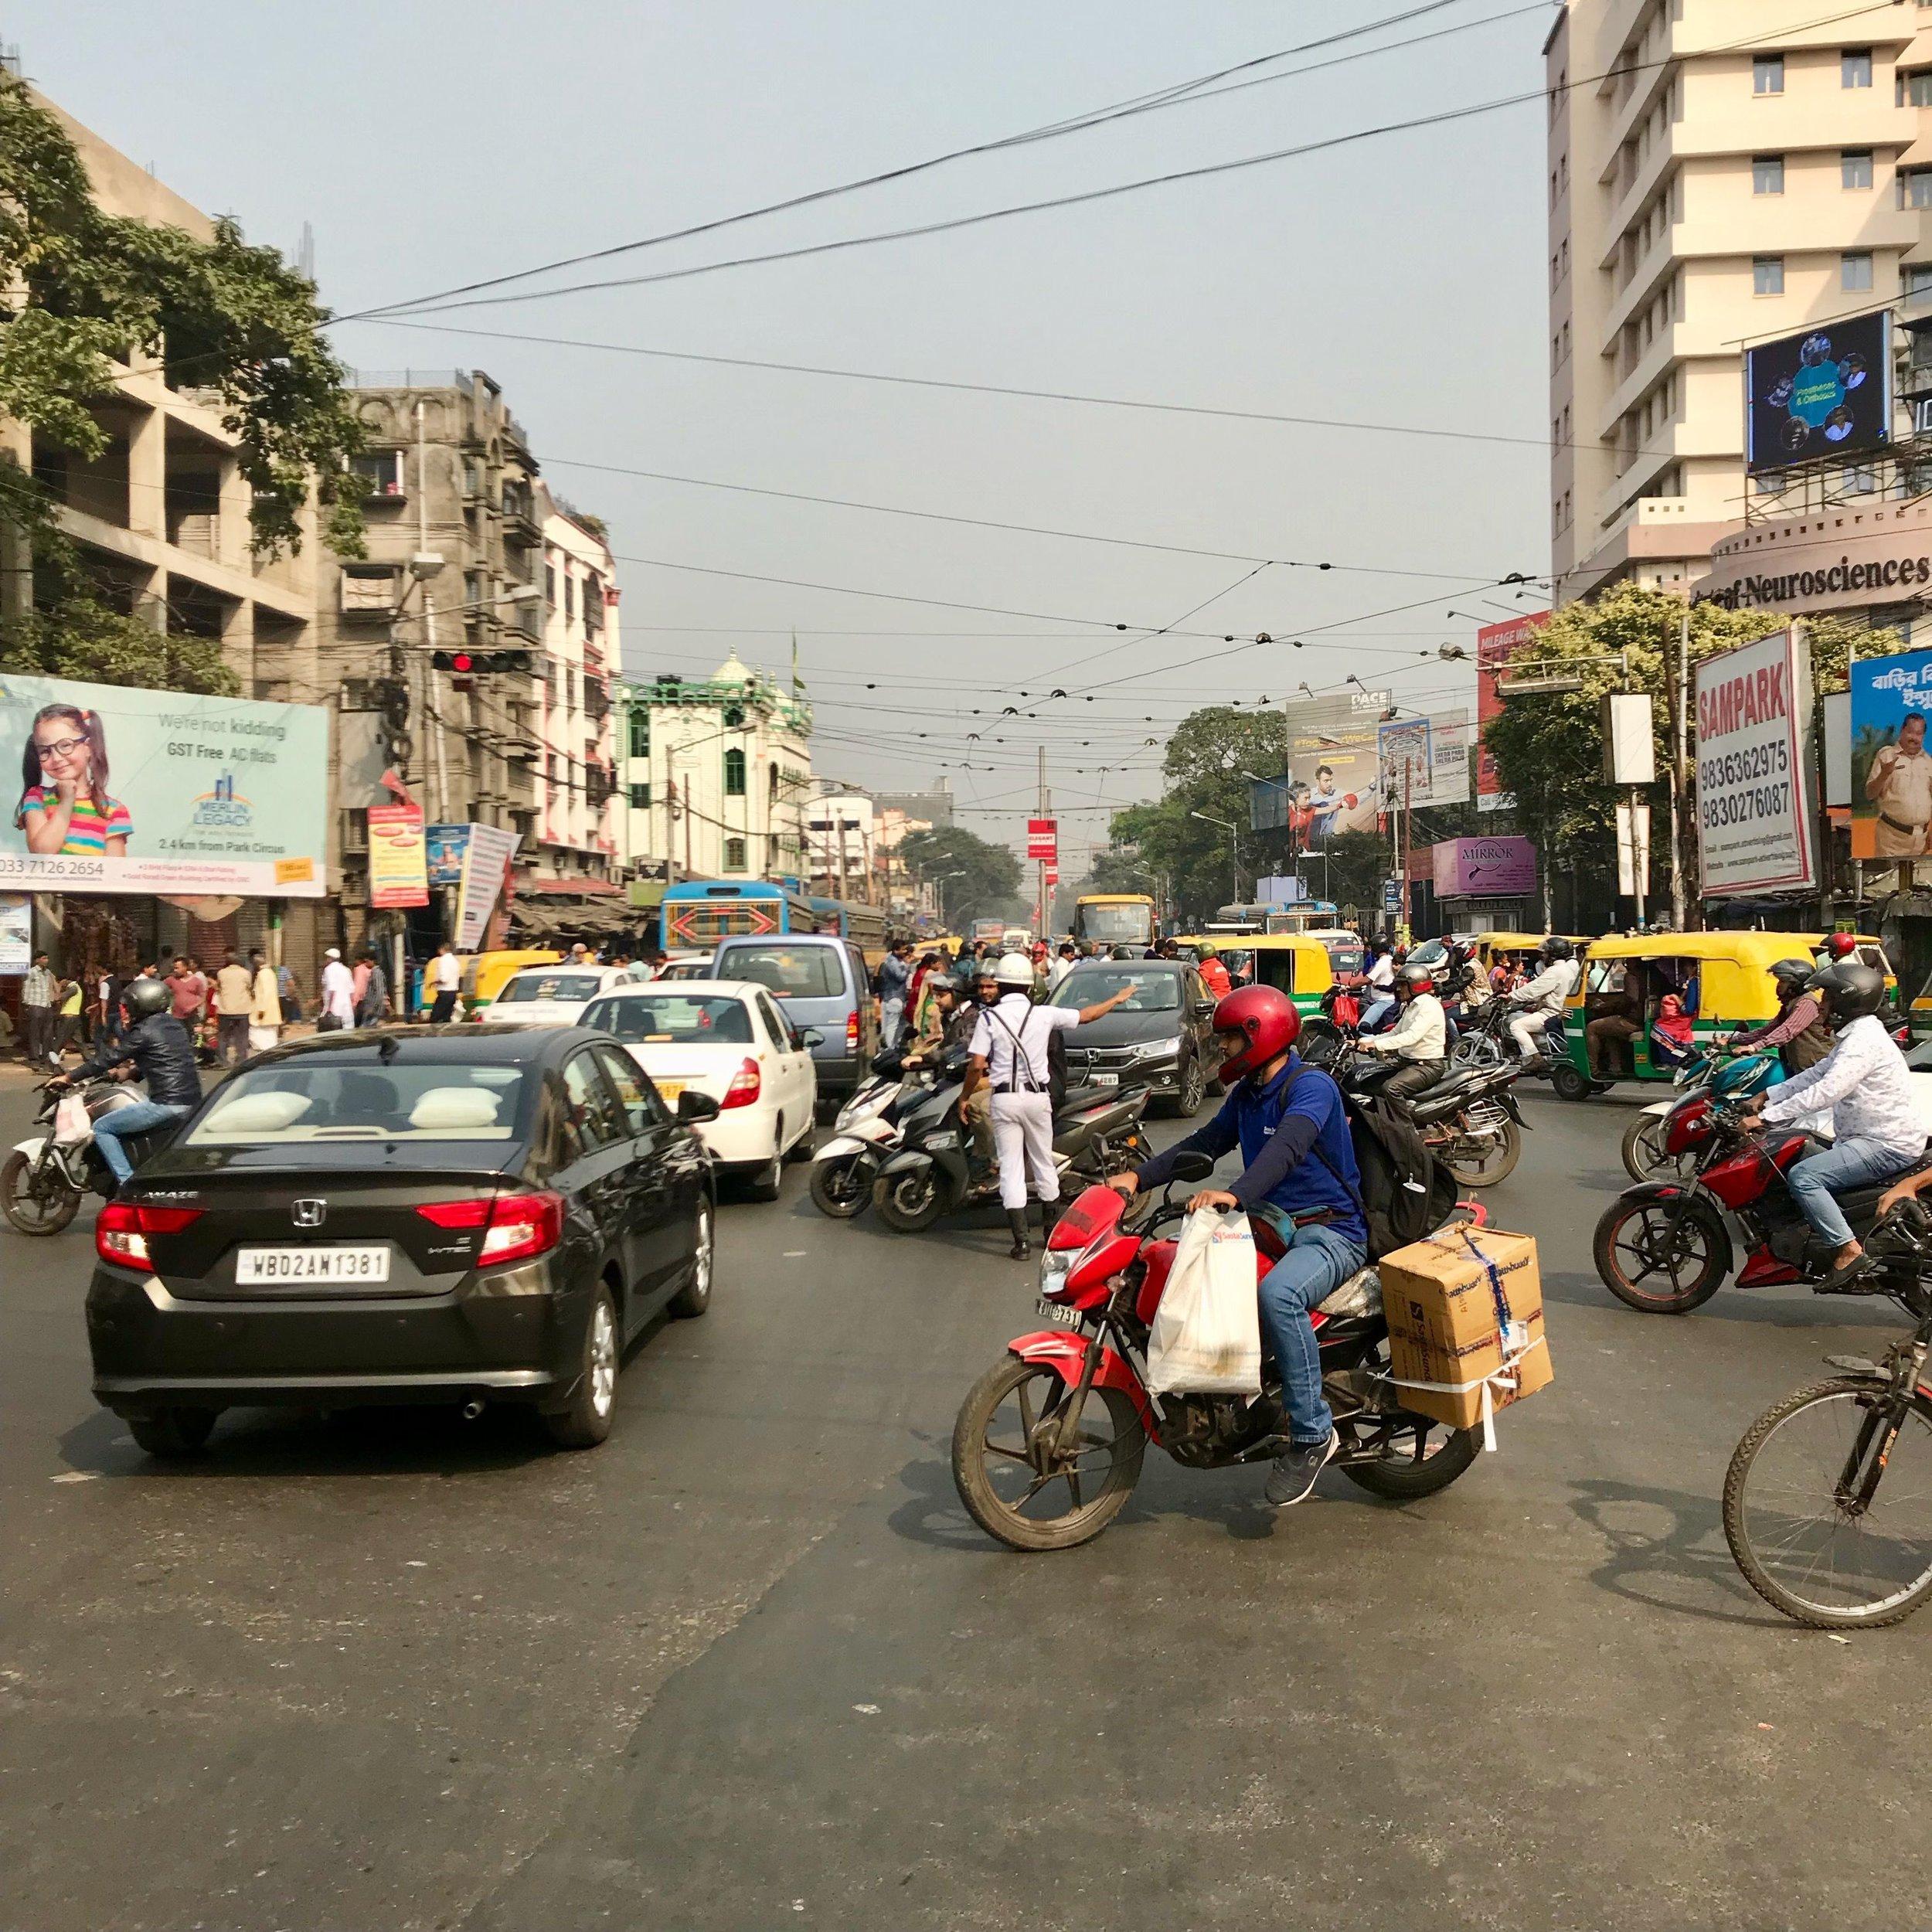 Calcutta (11 au 13 décembre)_15.jpg